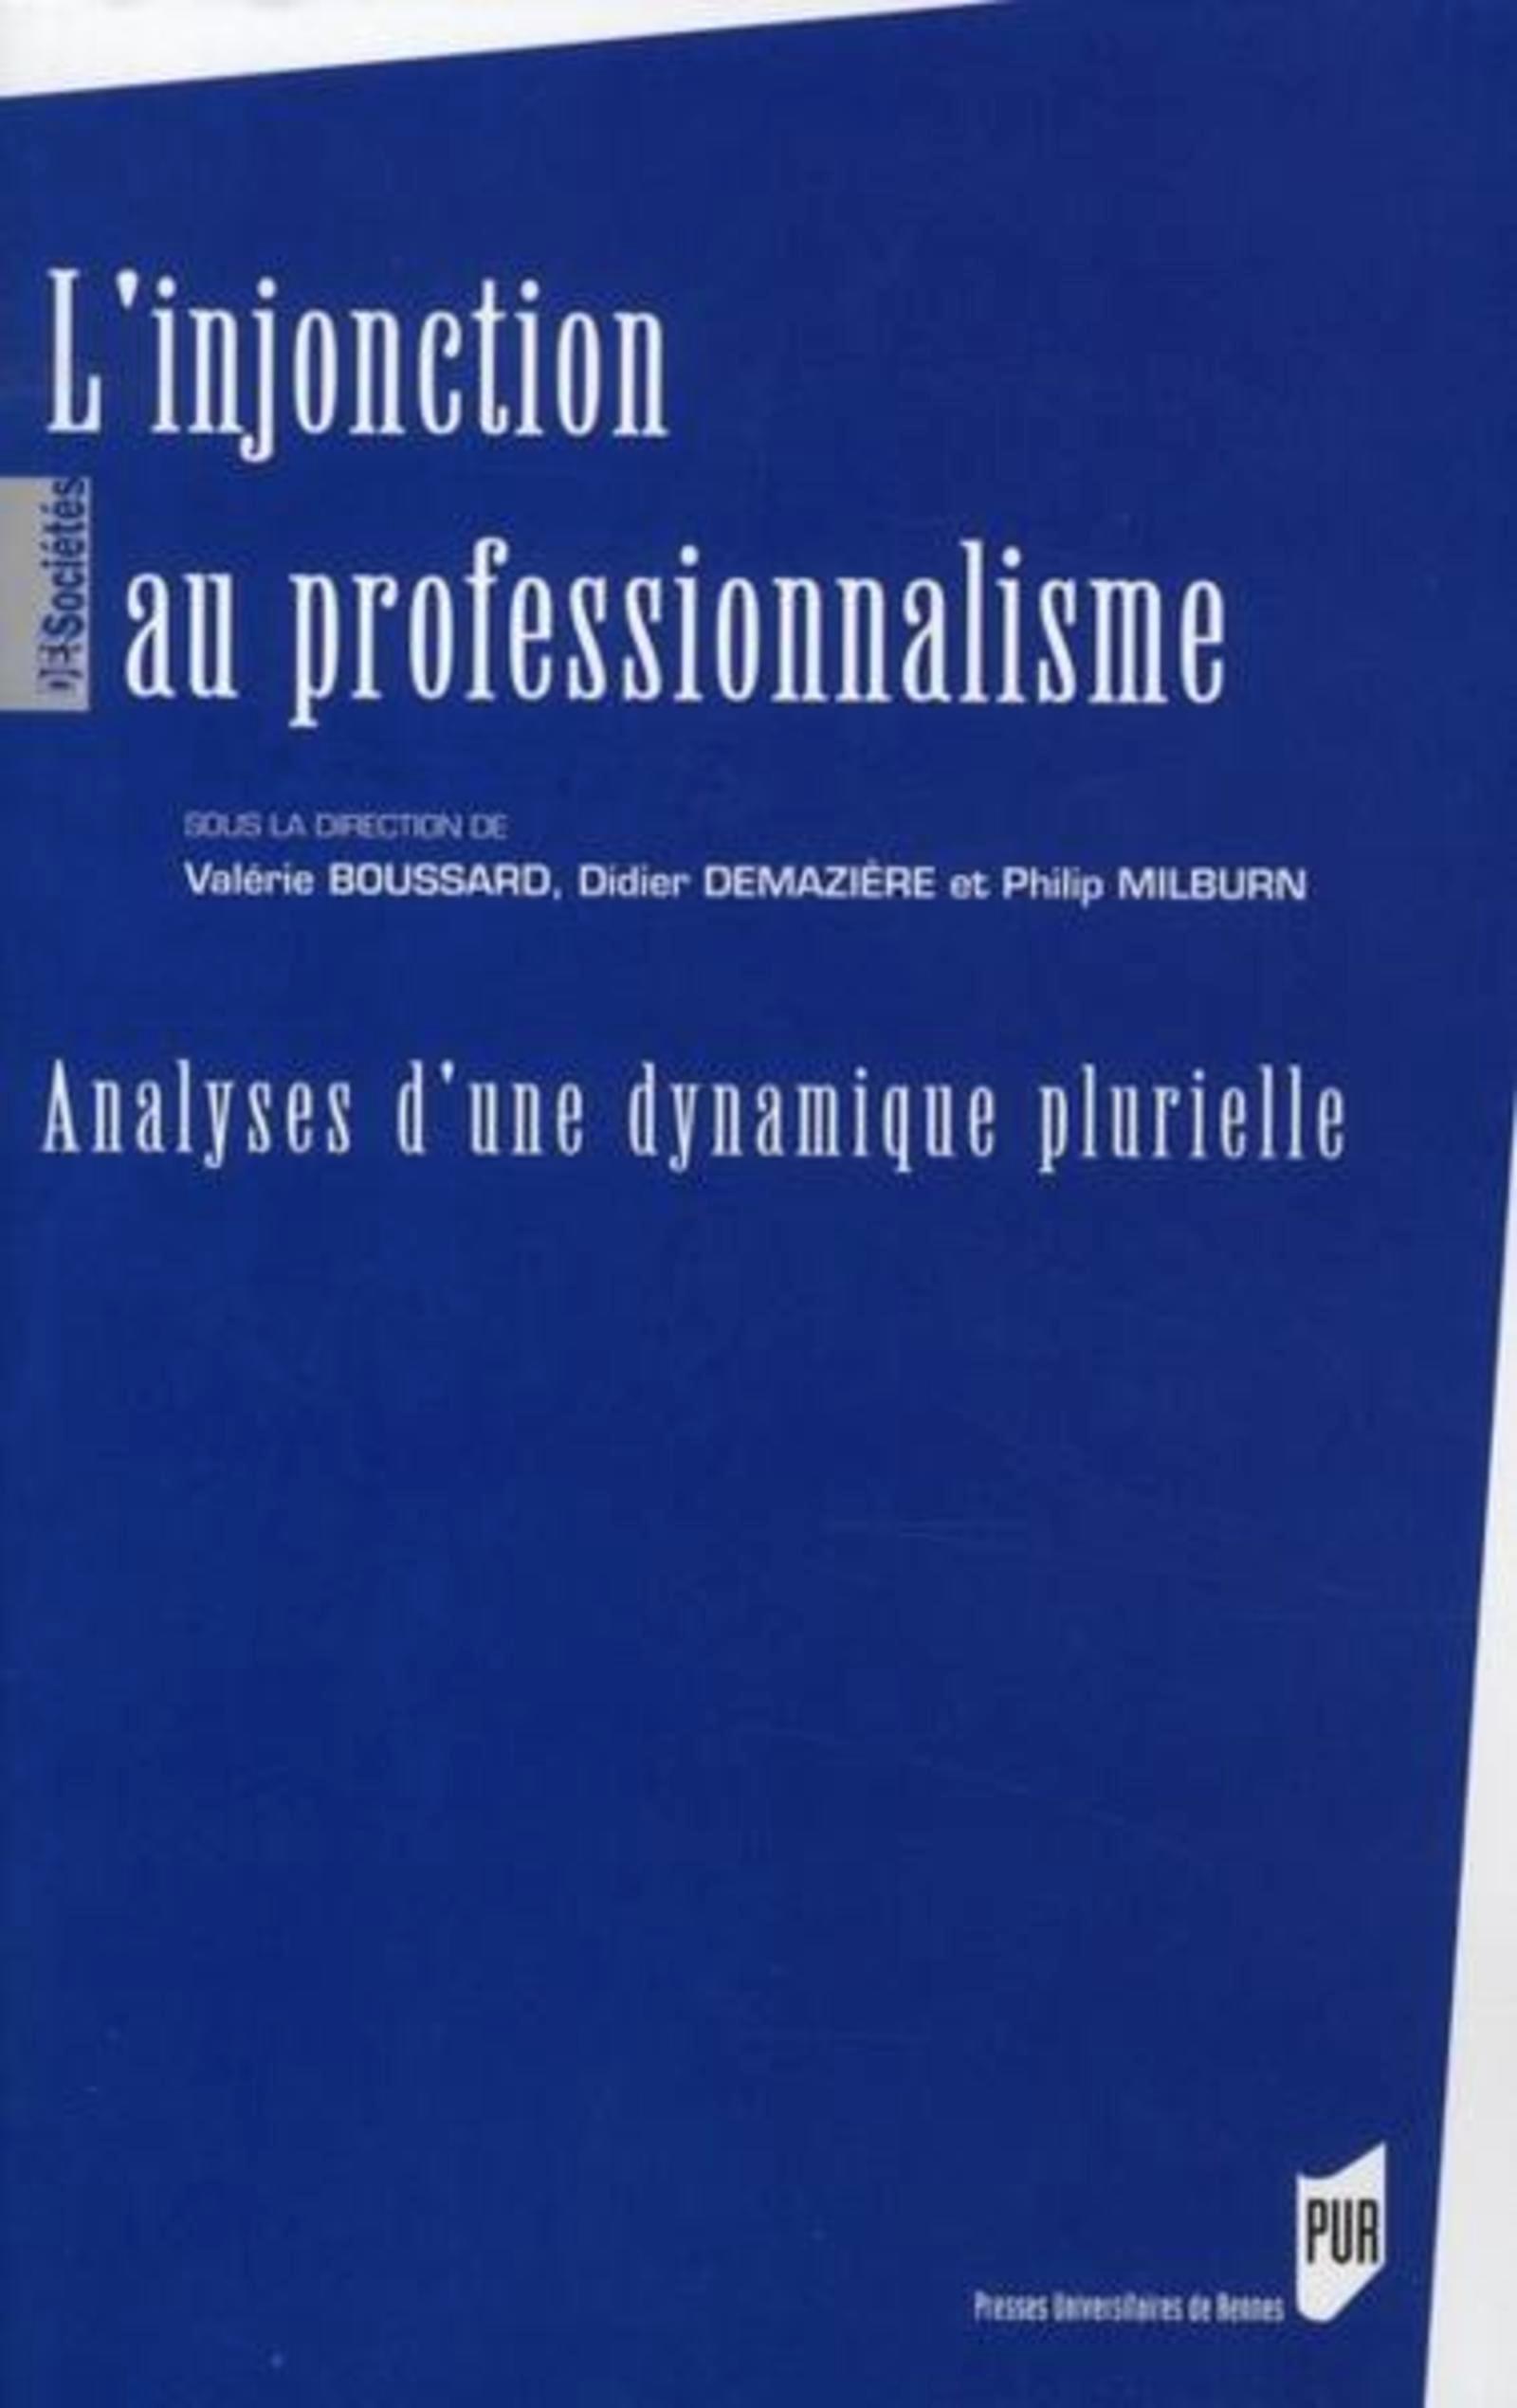 INJONCTION AU PROFESSIONNALISME